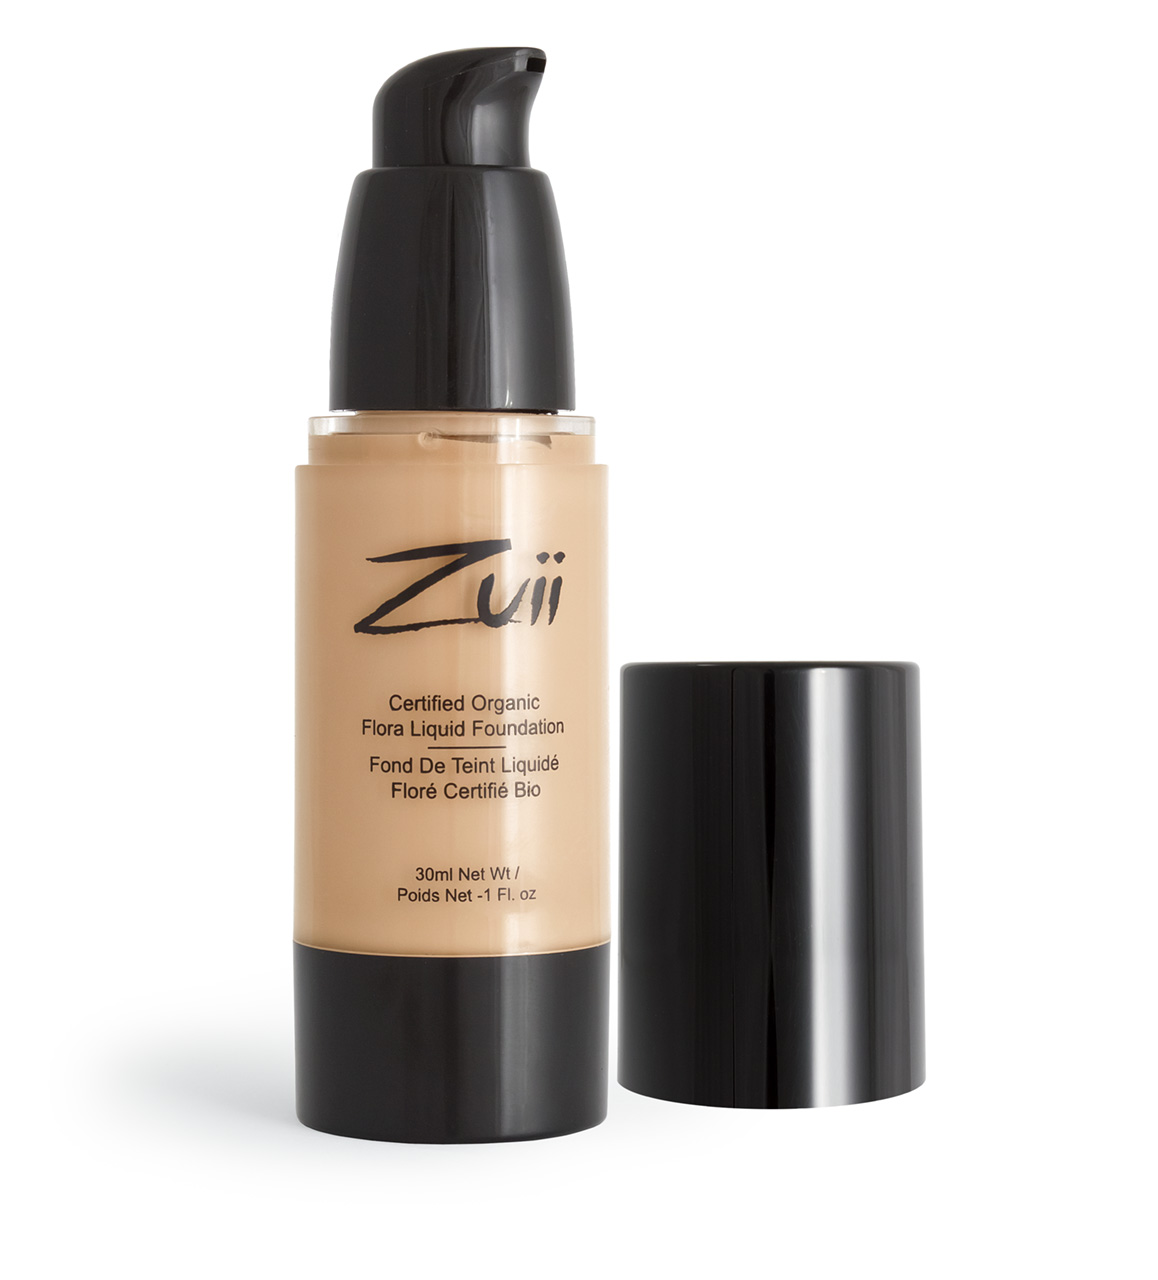 Zuii Certified Organic Flora Liquid Foundation Olive Medium